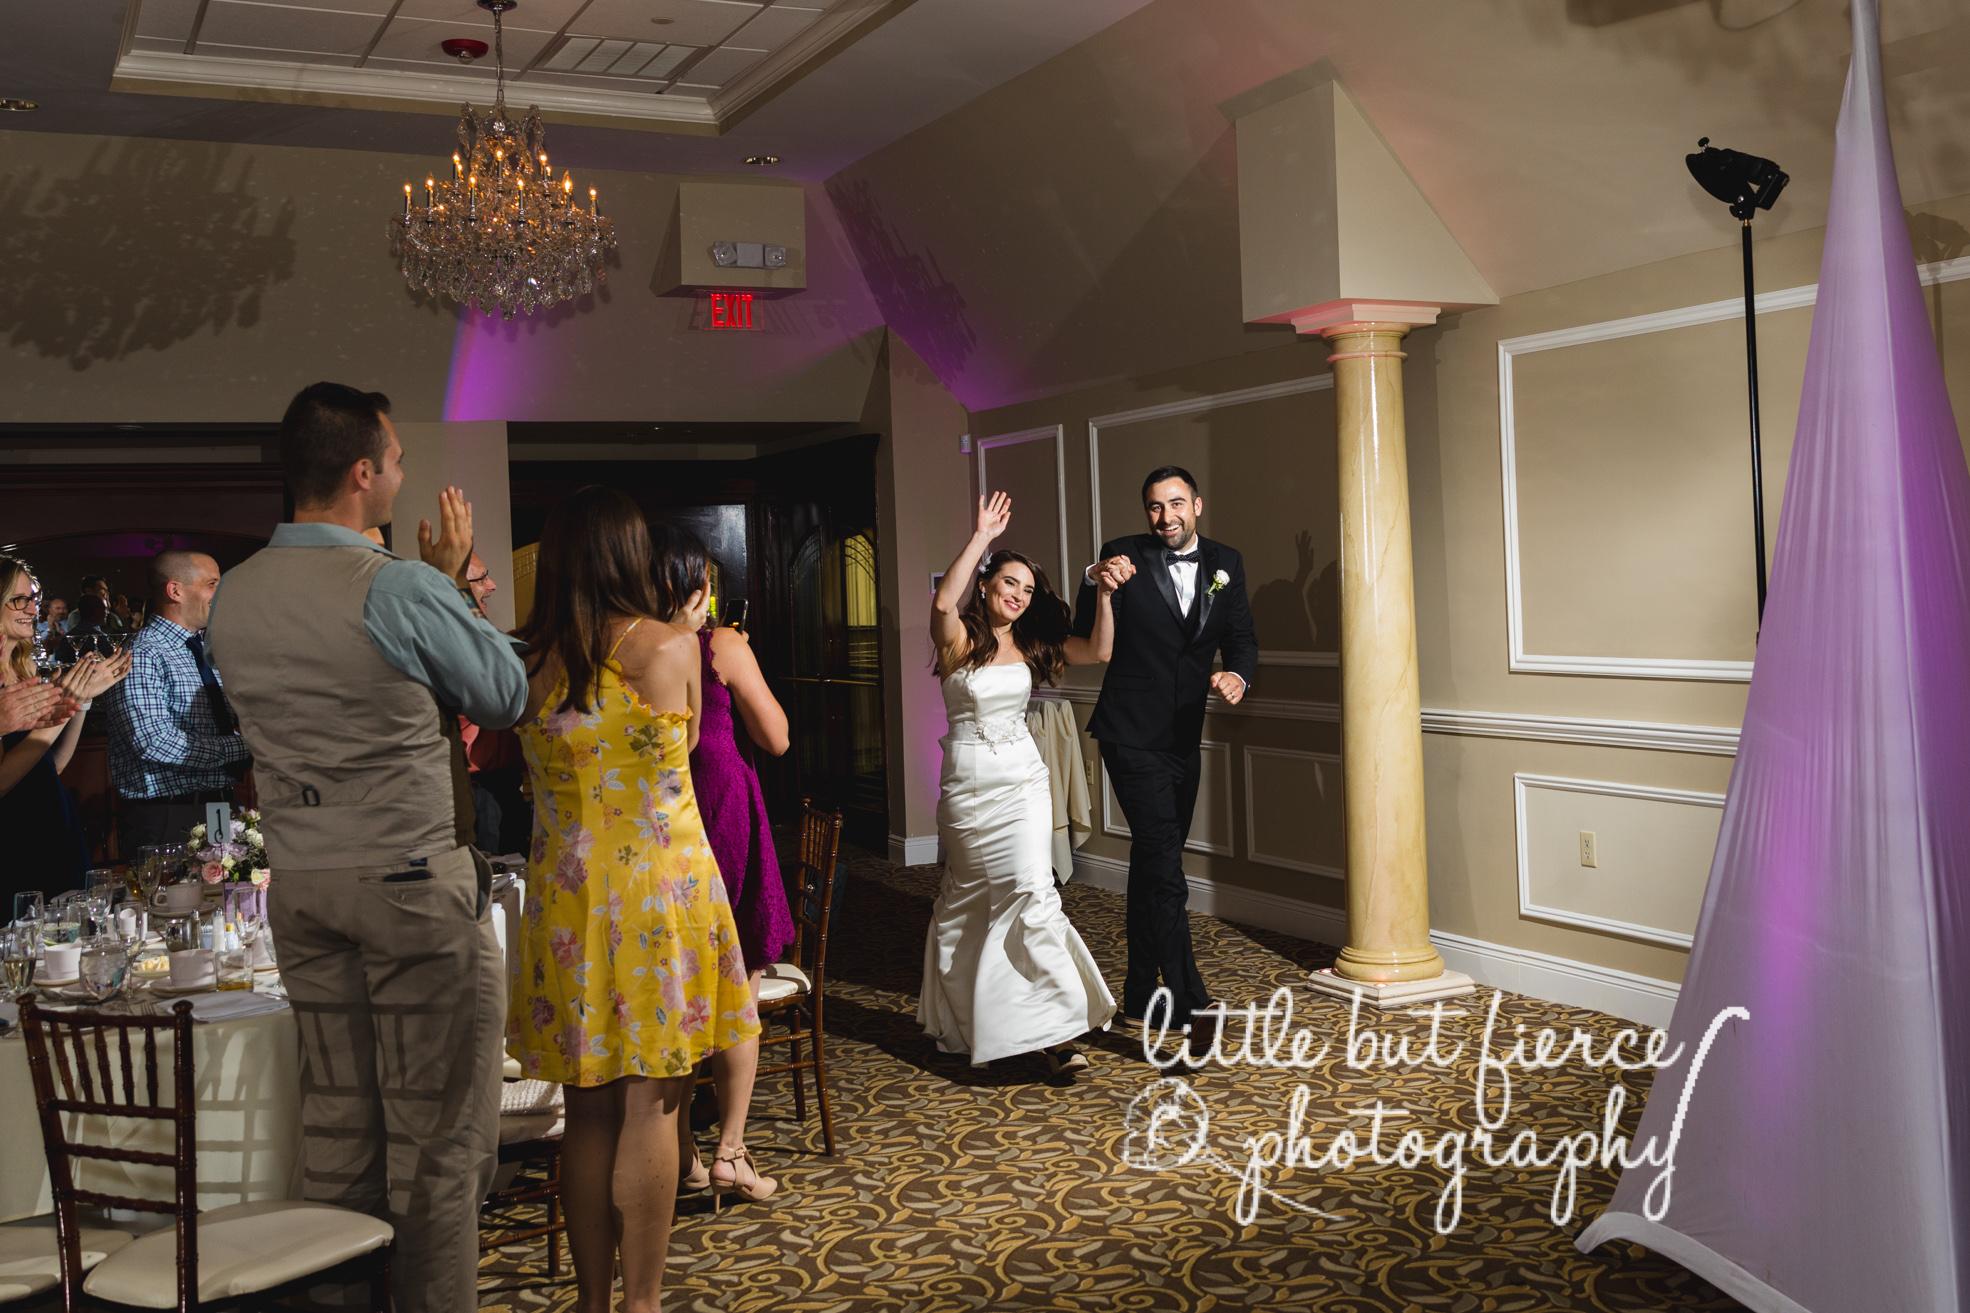 Wedding at Saint Joseph's Church, Senate Garage and The Chateau in Kingston, New York- Hudson Valley